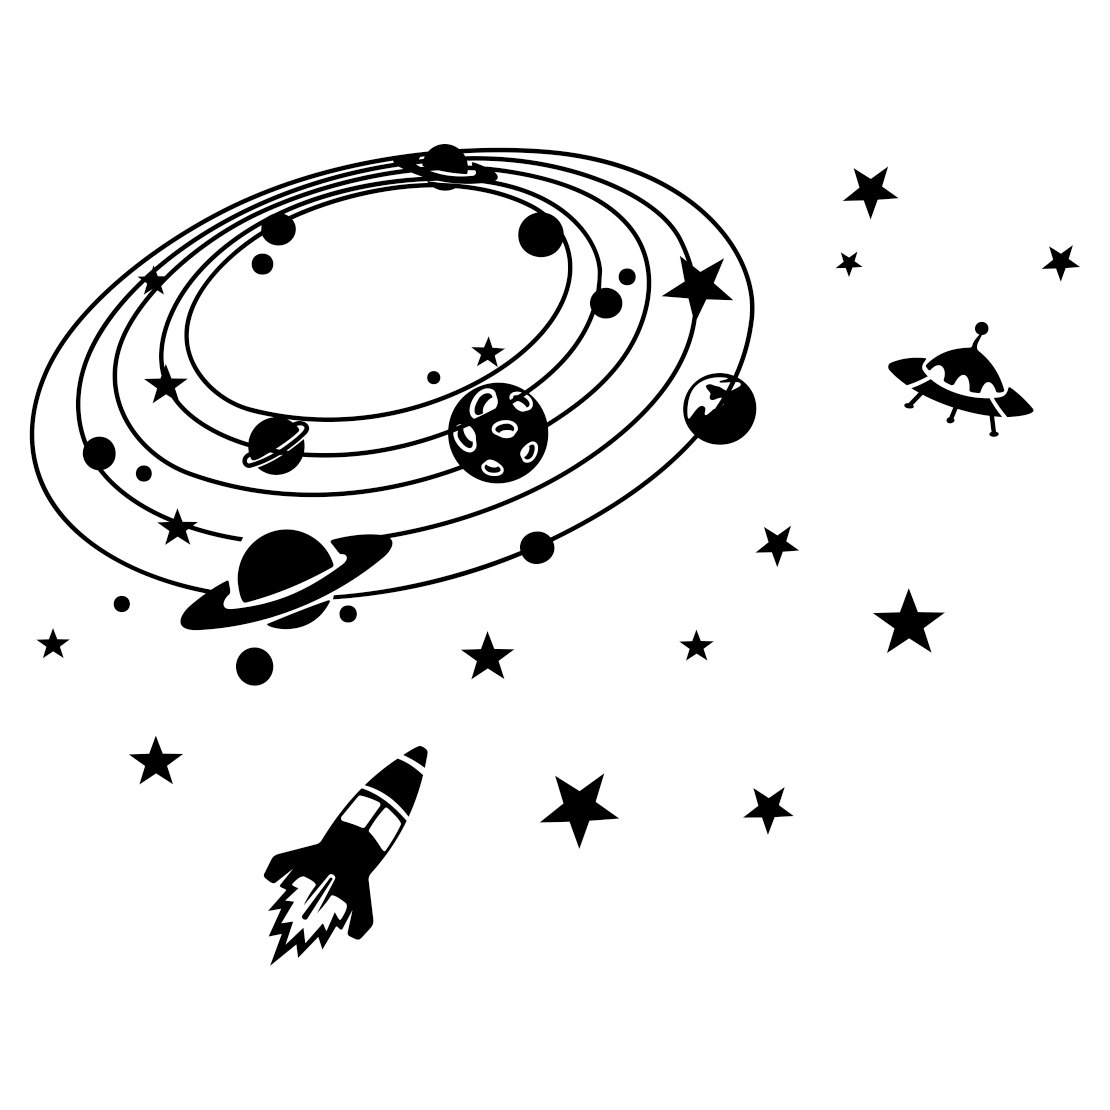 Star Sky Spacecraft Ufo Graphics Design Svg